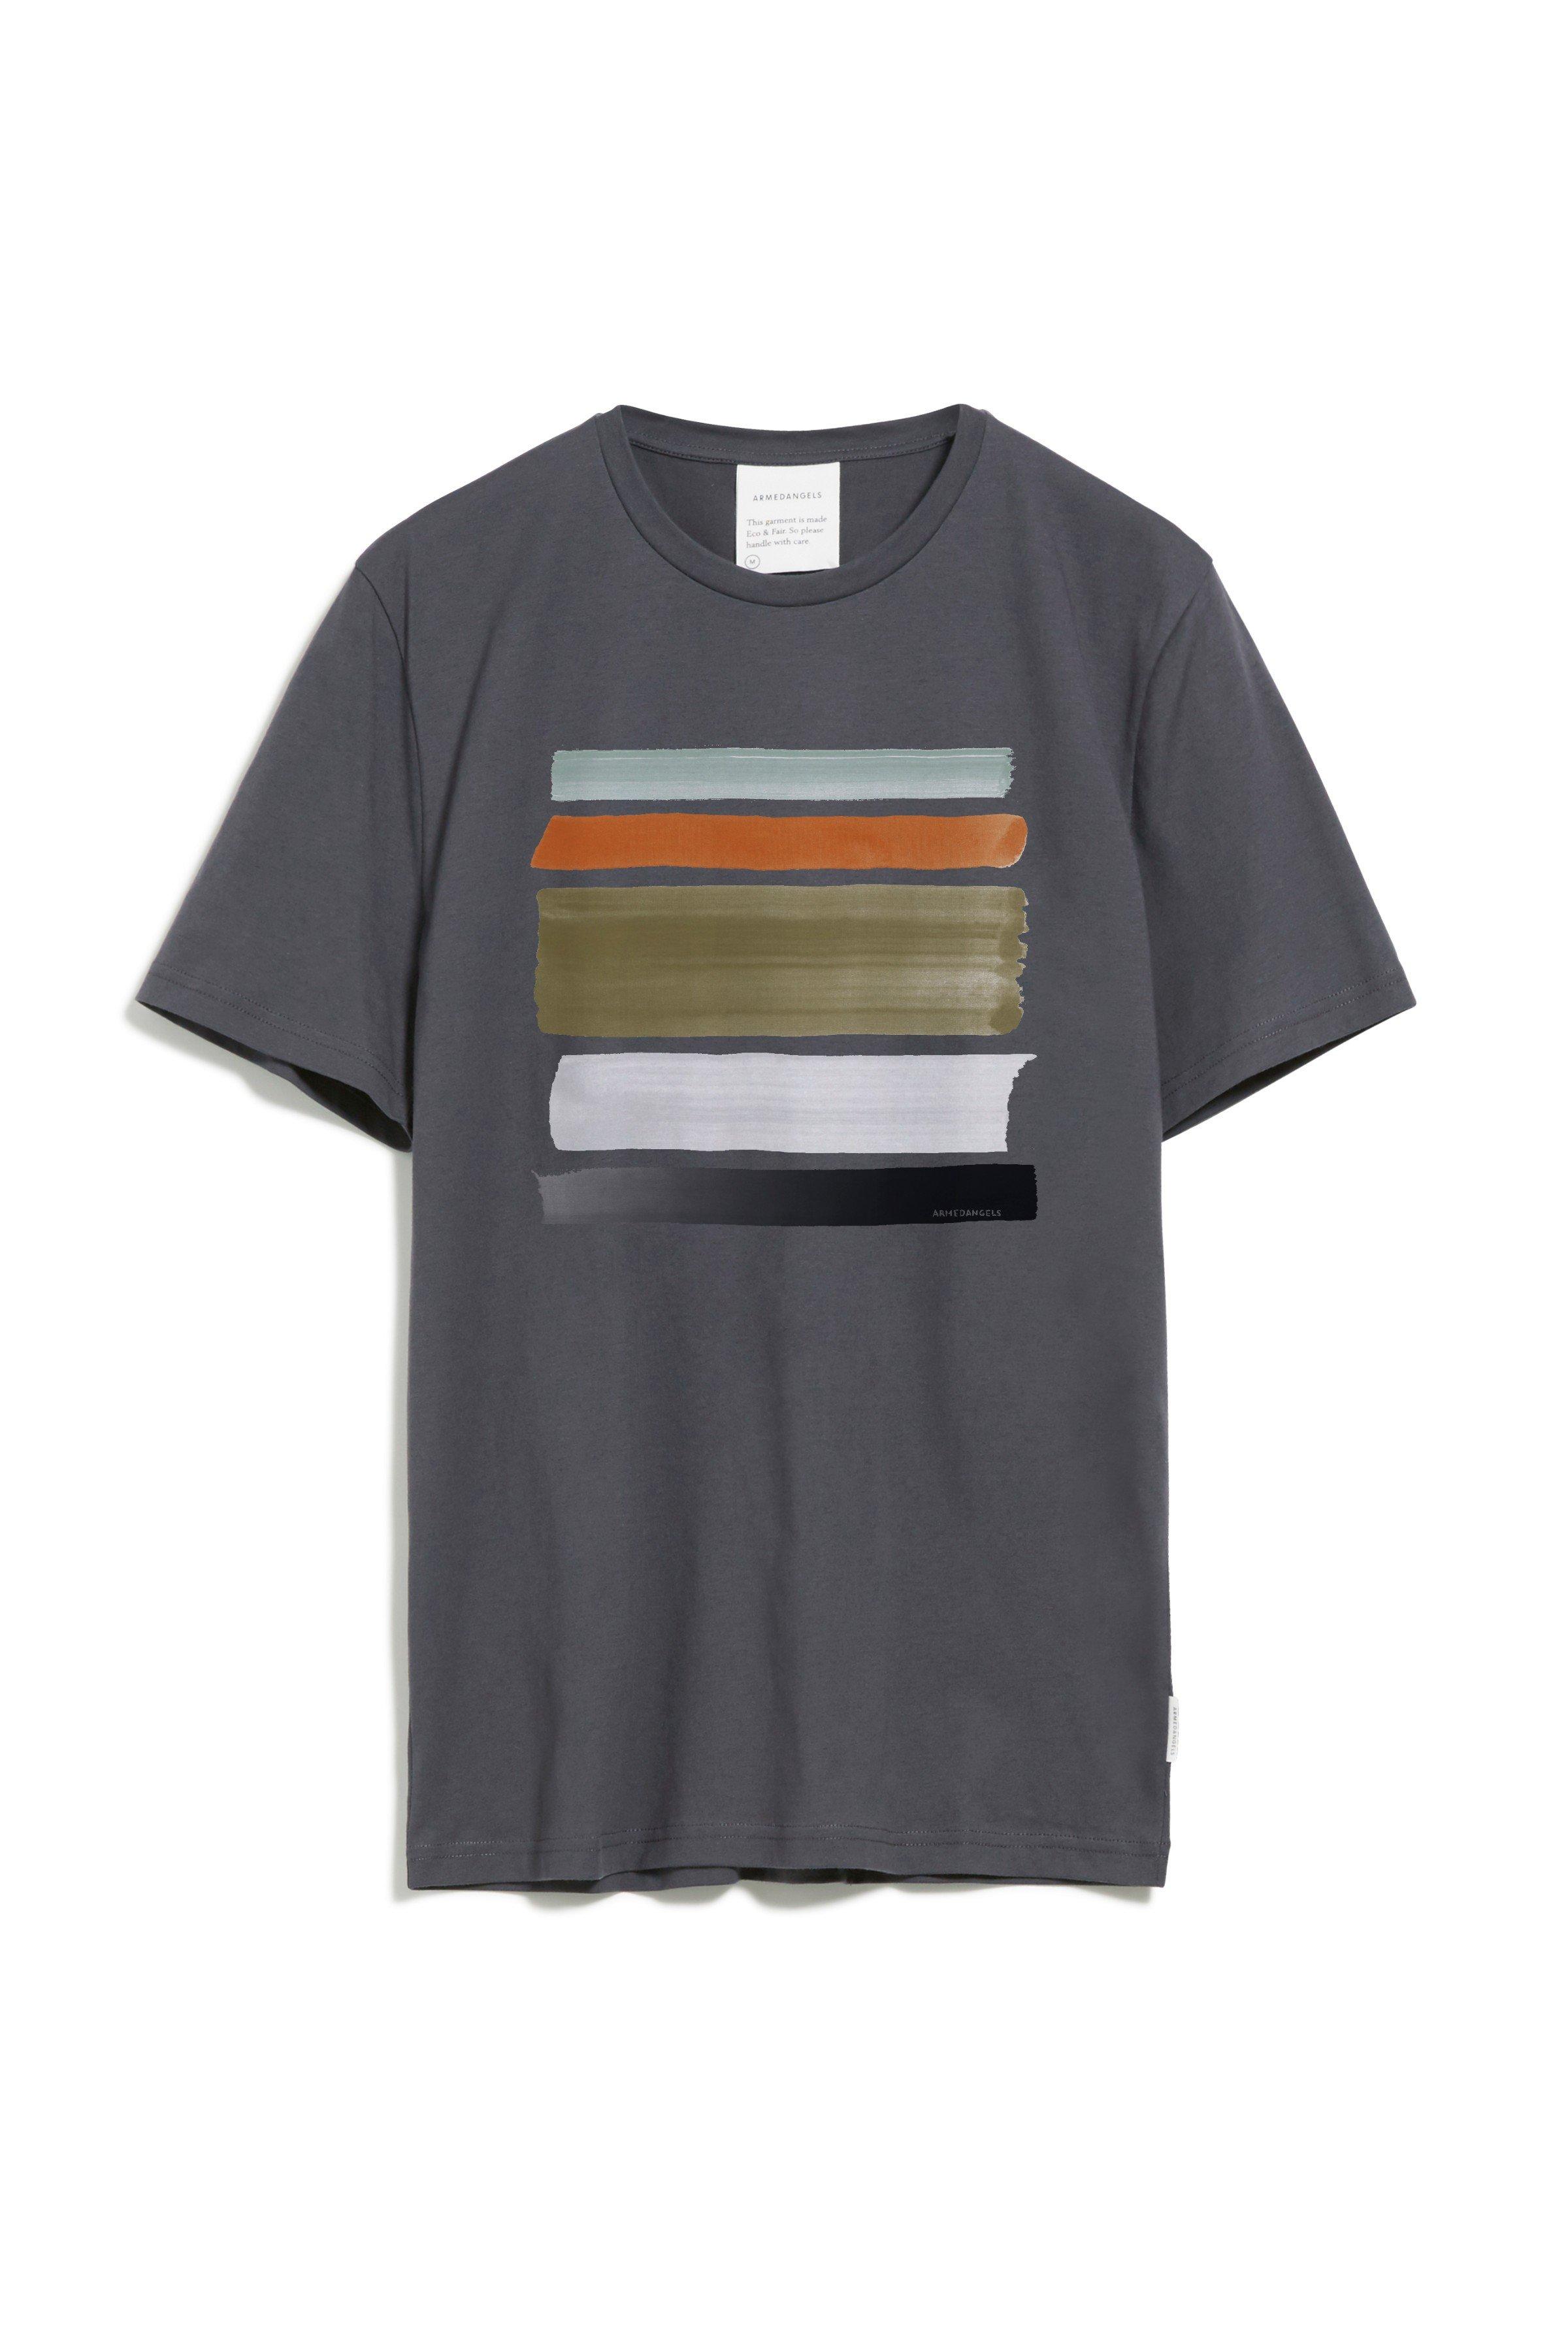 T-Shirt Jaames Strokes Grau